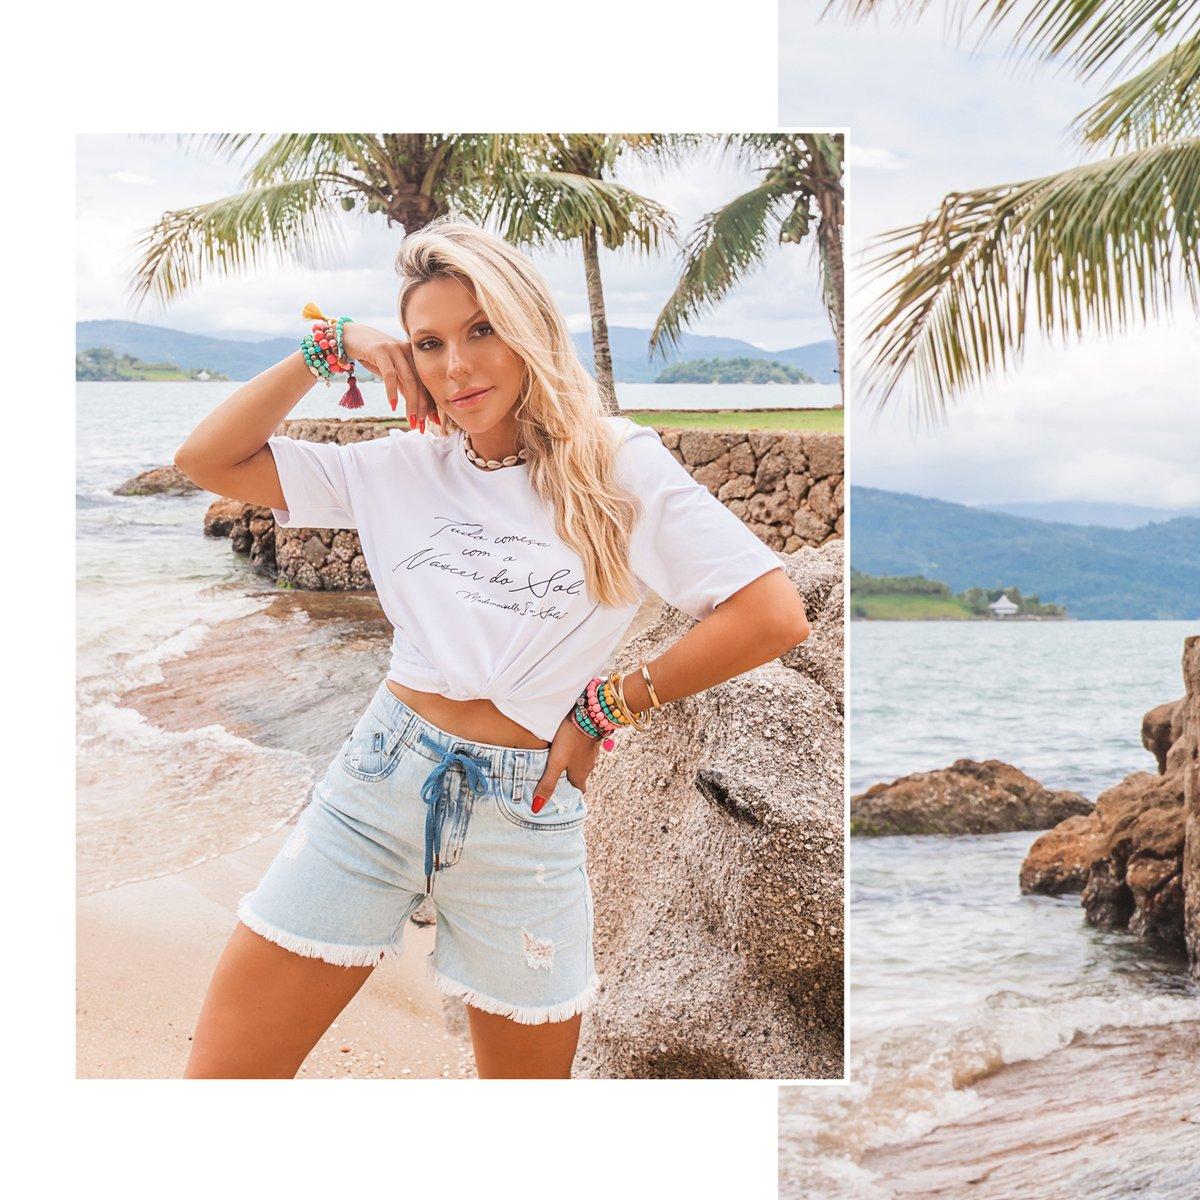 Coringas da estação, para os dia quentes e cheios de sol! Na foto @mariliabenetton  #monnari #monnarijeans #euusomonnari #denim #jeans #verao #veraomonnari #verao21 #summer #summer21 #fashionsummer #newcolletction  #jeansmonnari #jeanswear #mademoiselledusoleil #solar